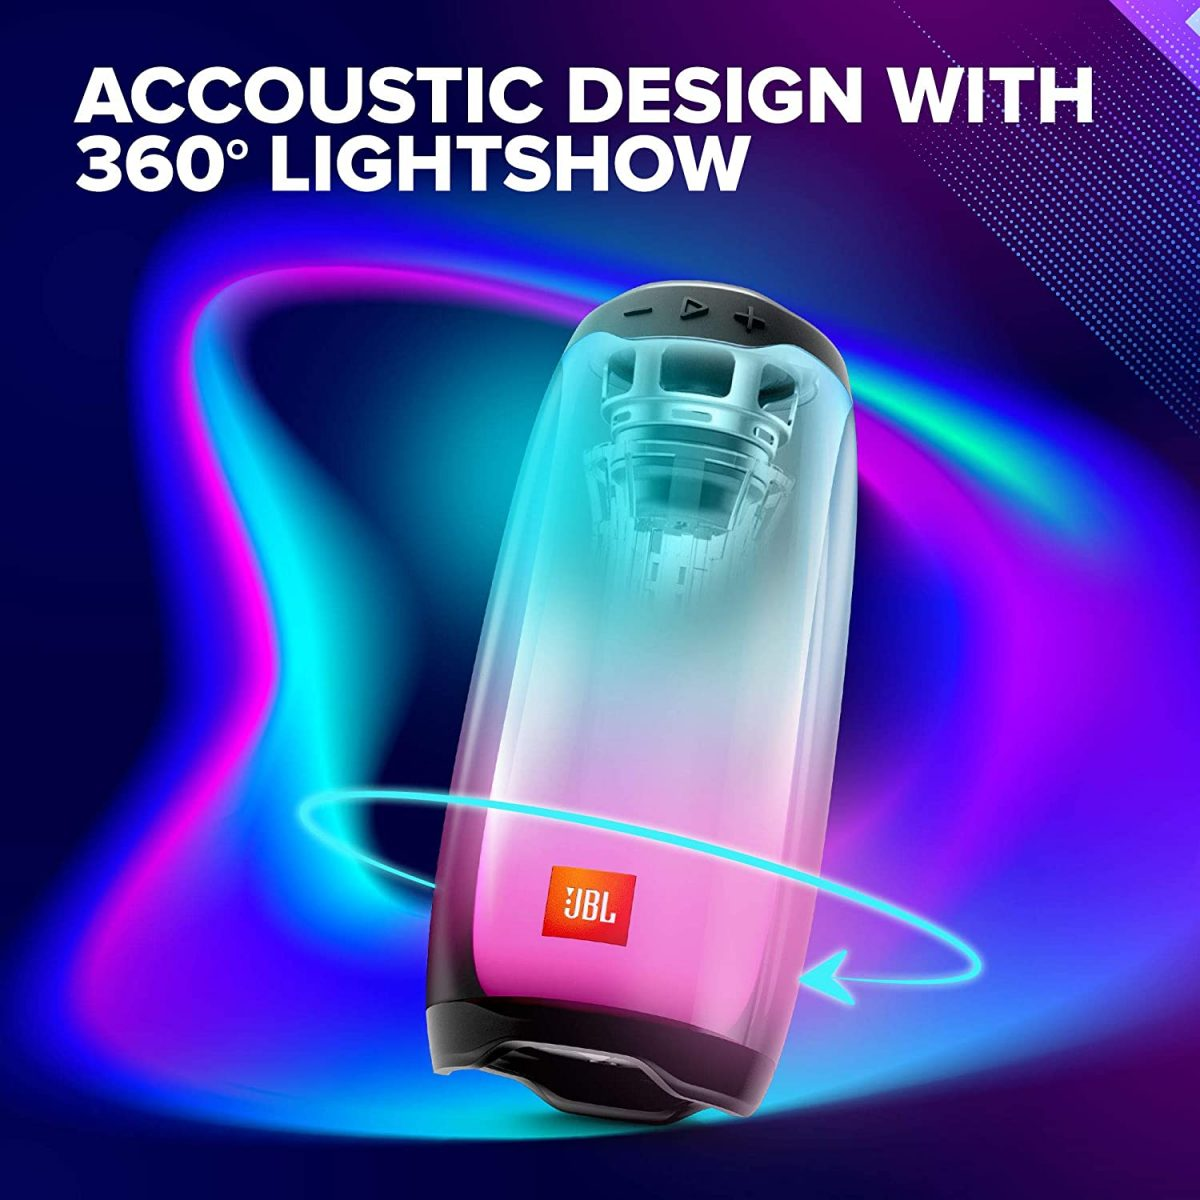 JBL Pulse 4 Portable Bluetooth Speaker with 360-Degree LED Lightshow